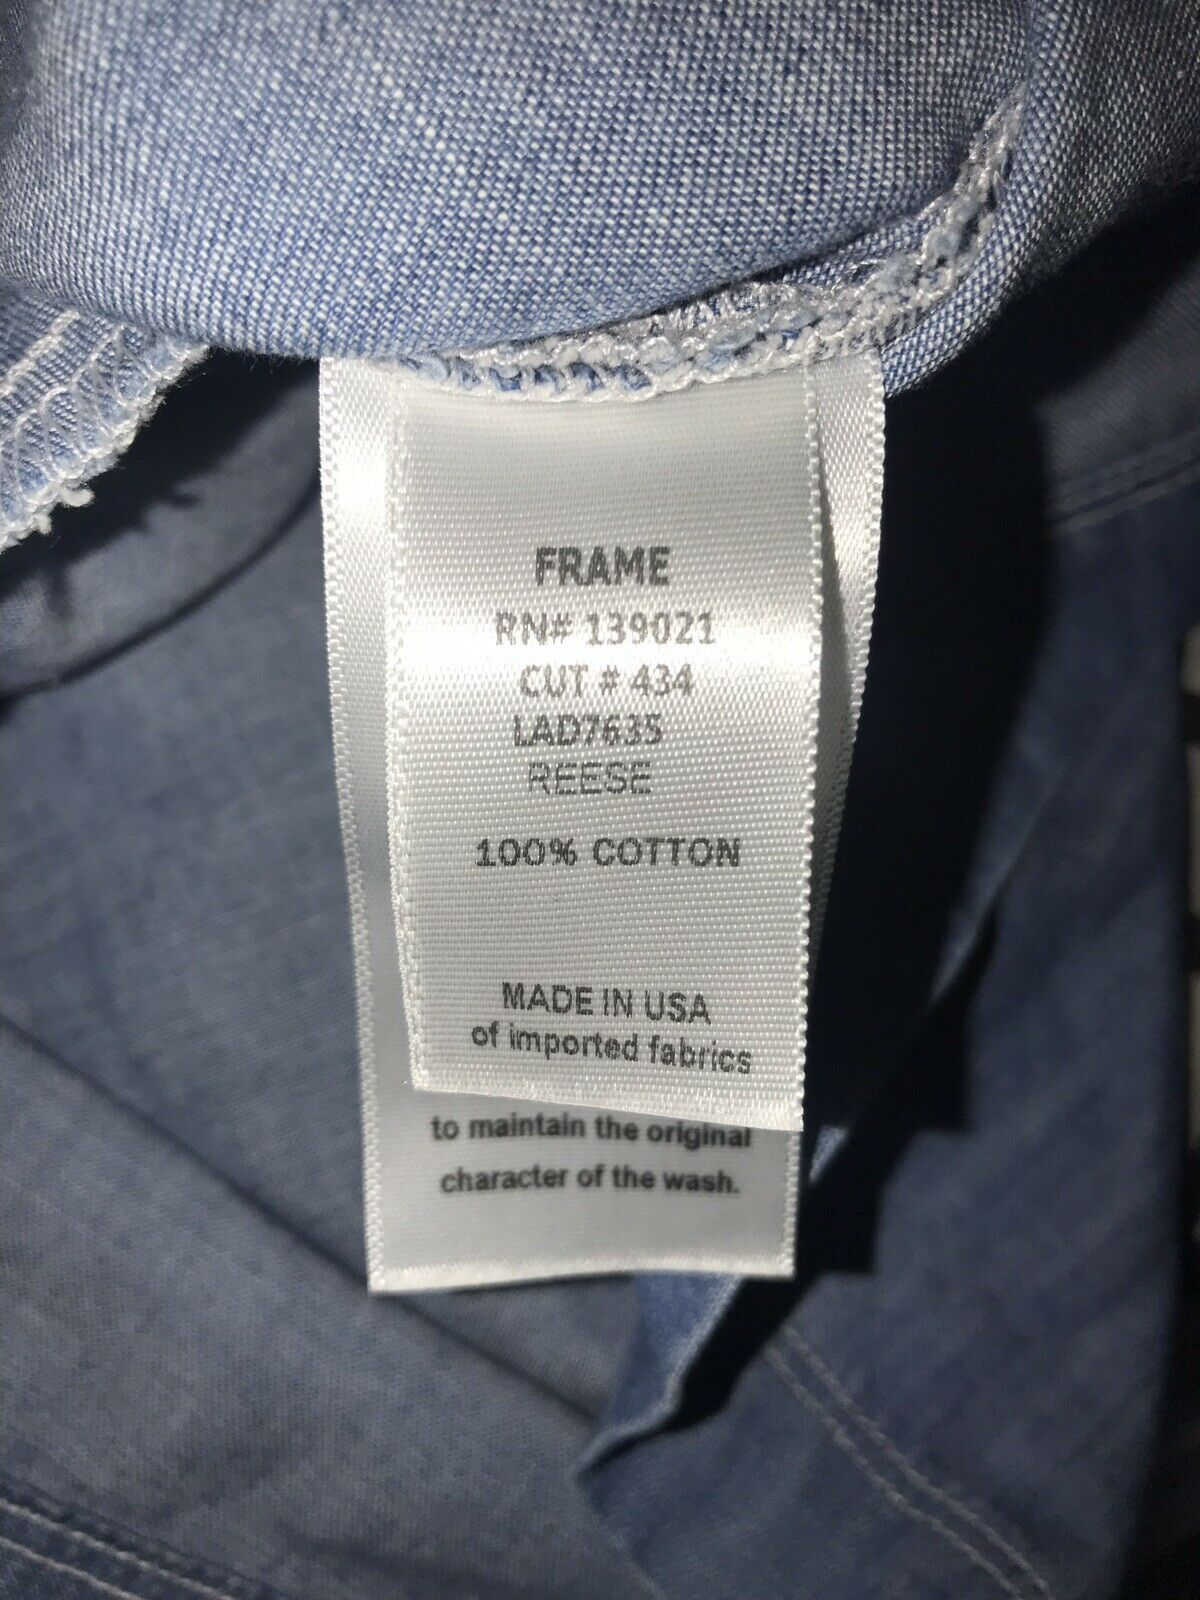 Frame Le apron Reese Soft Denim Overall Skirt Dre… - image 5